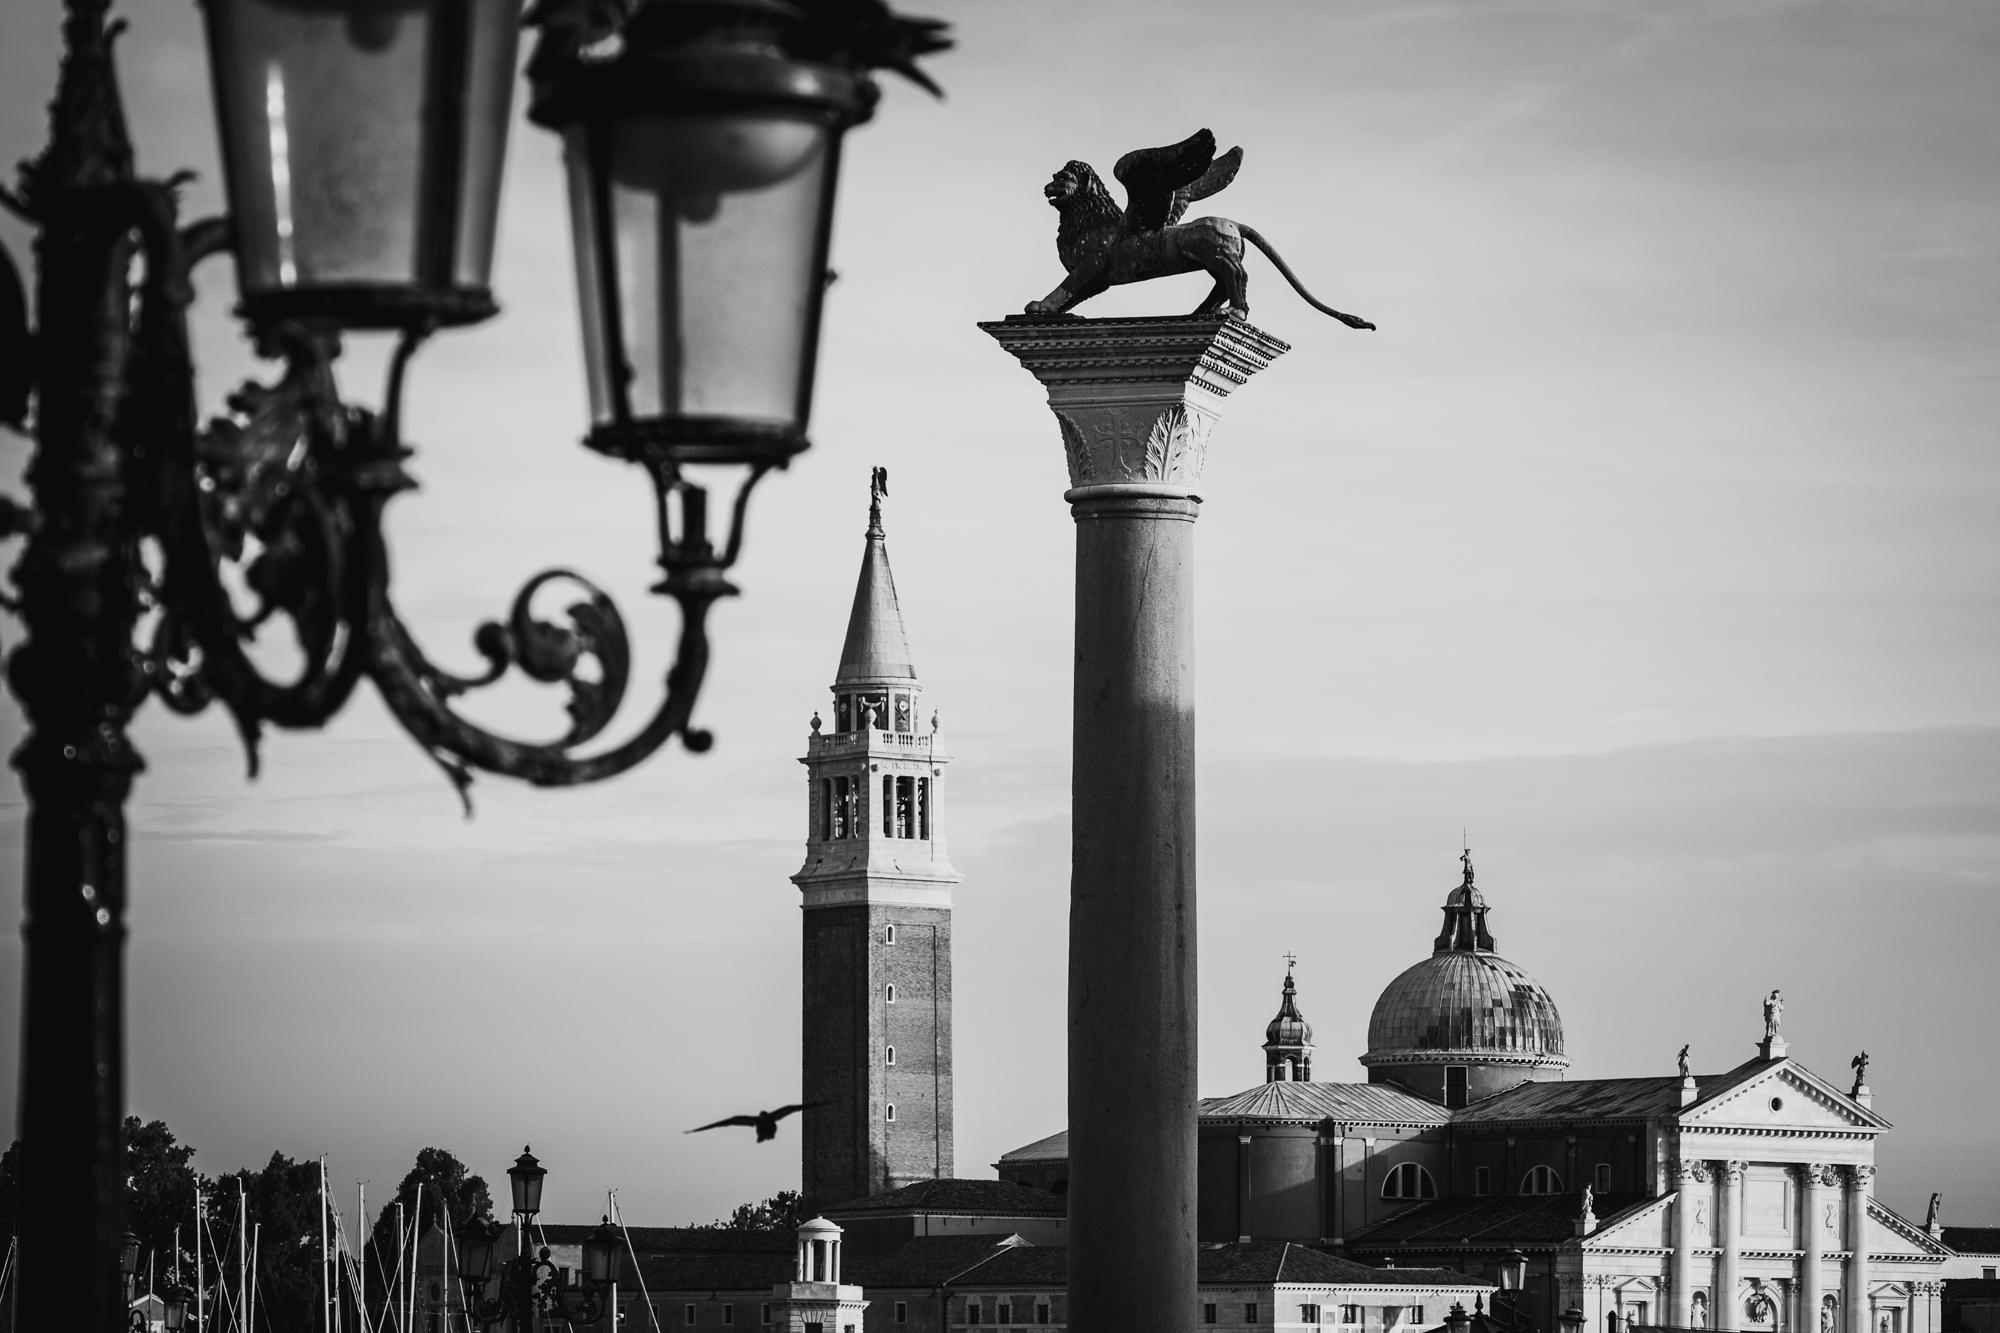 A photo of the Church of San Giorgio Maggiore across the San Marco Basin taken by Trevor Sherwin